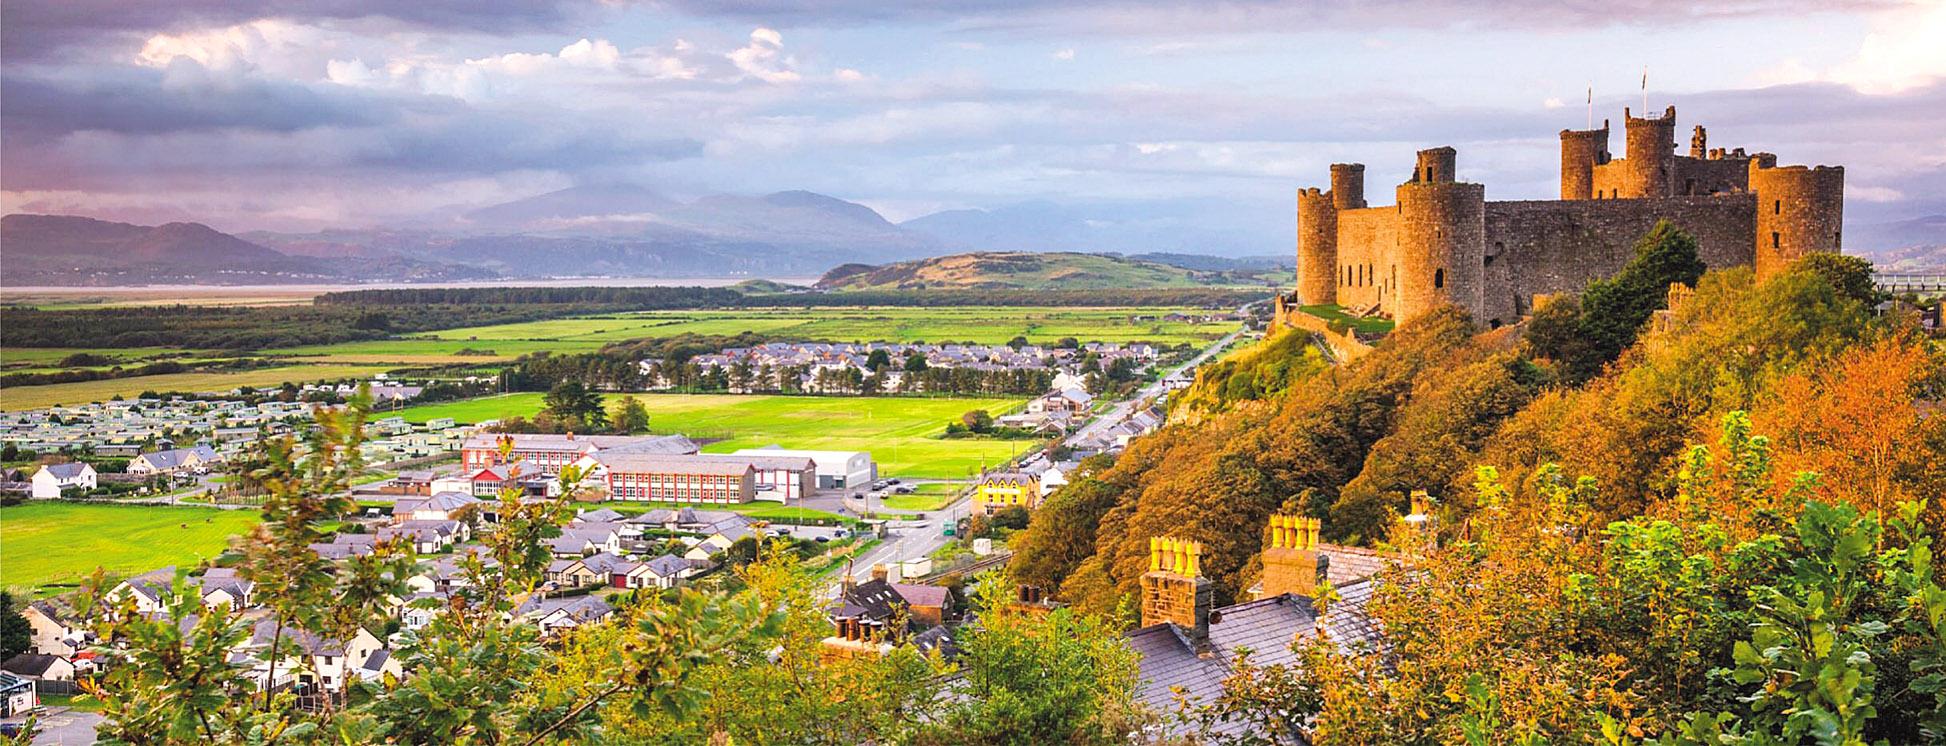 Harlech Castle, Snowdonia, Wales by Alan Copson.jpg